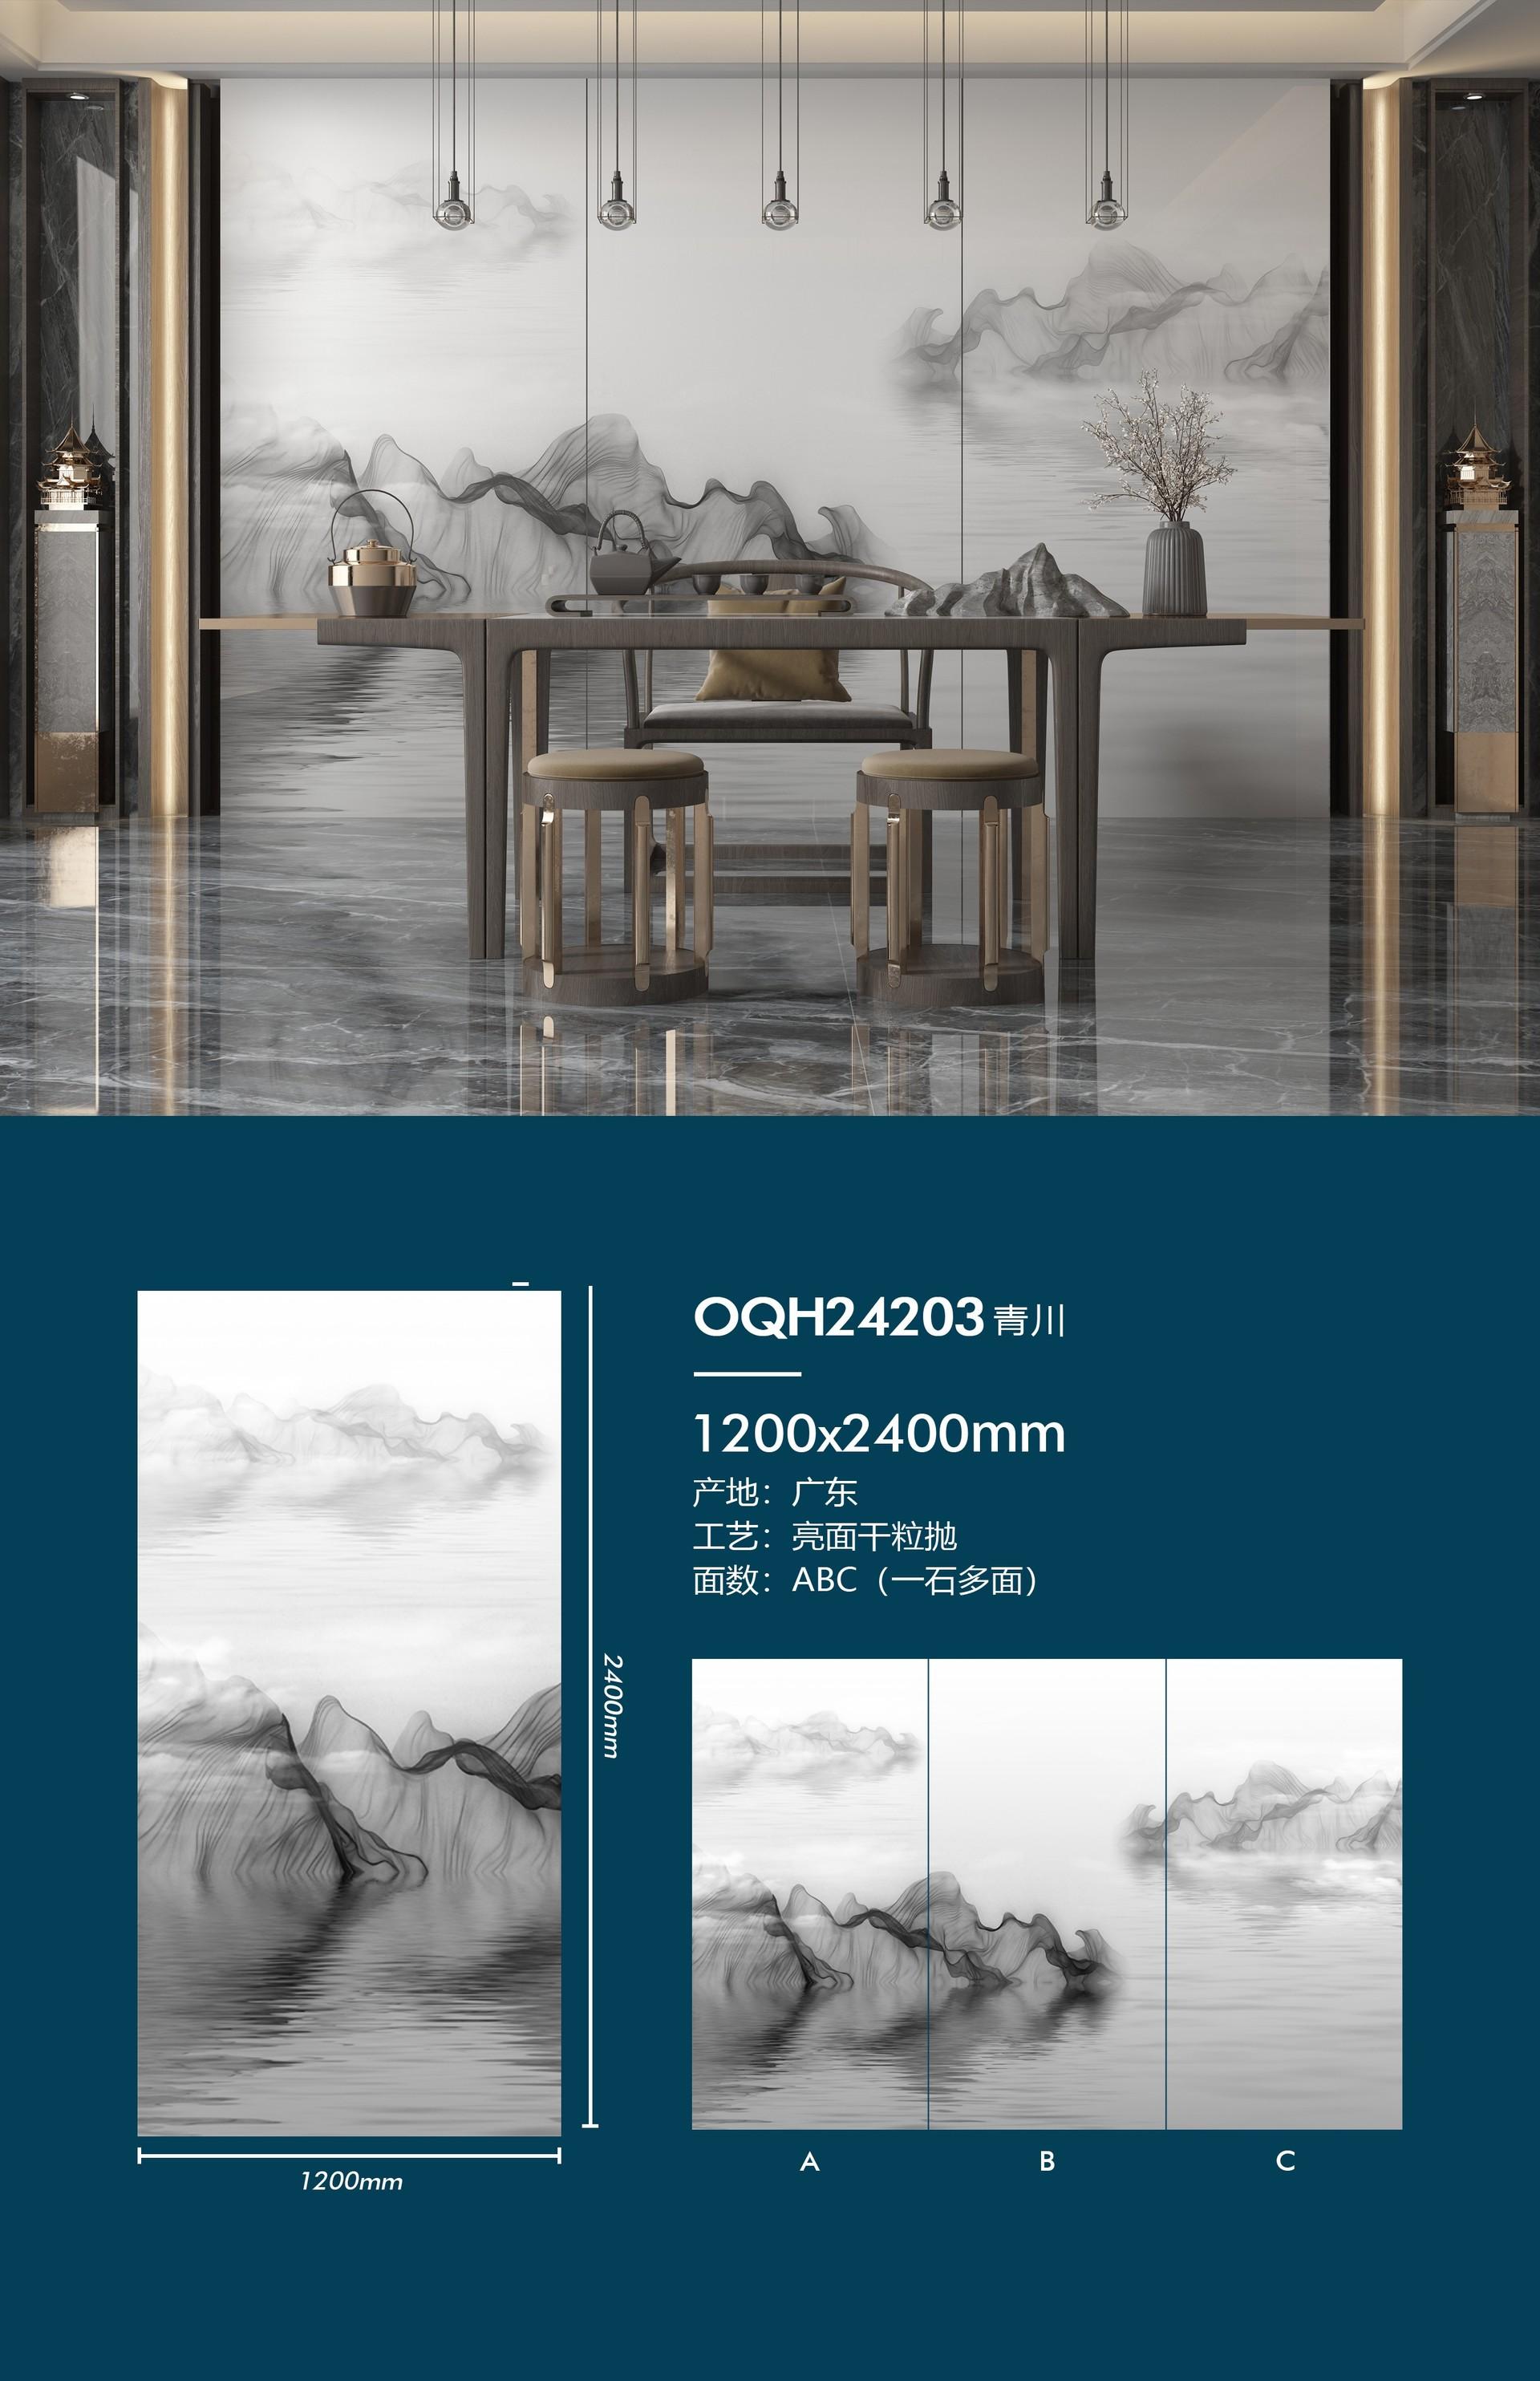 OQH24203 青川.jpg